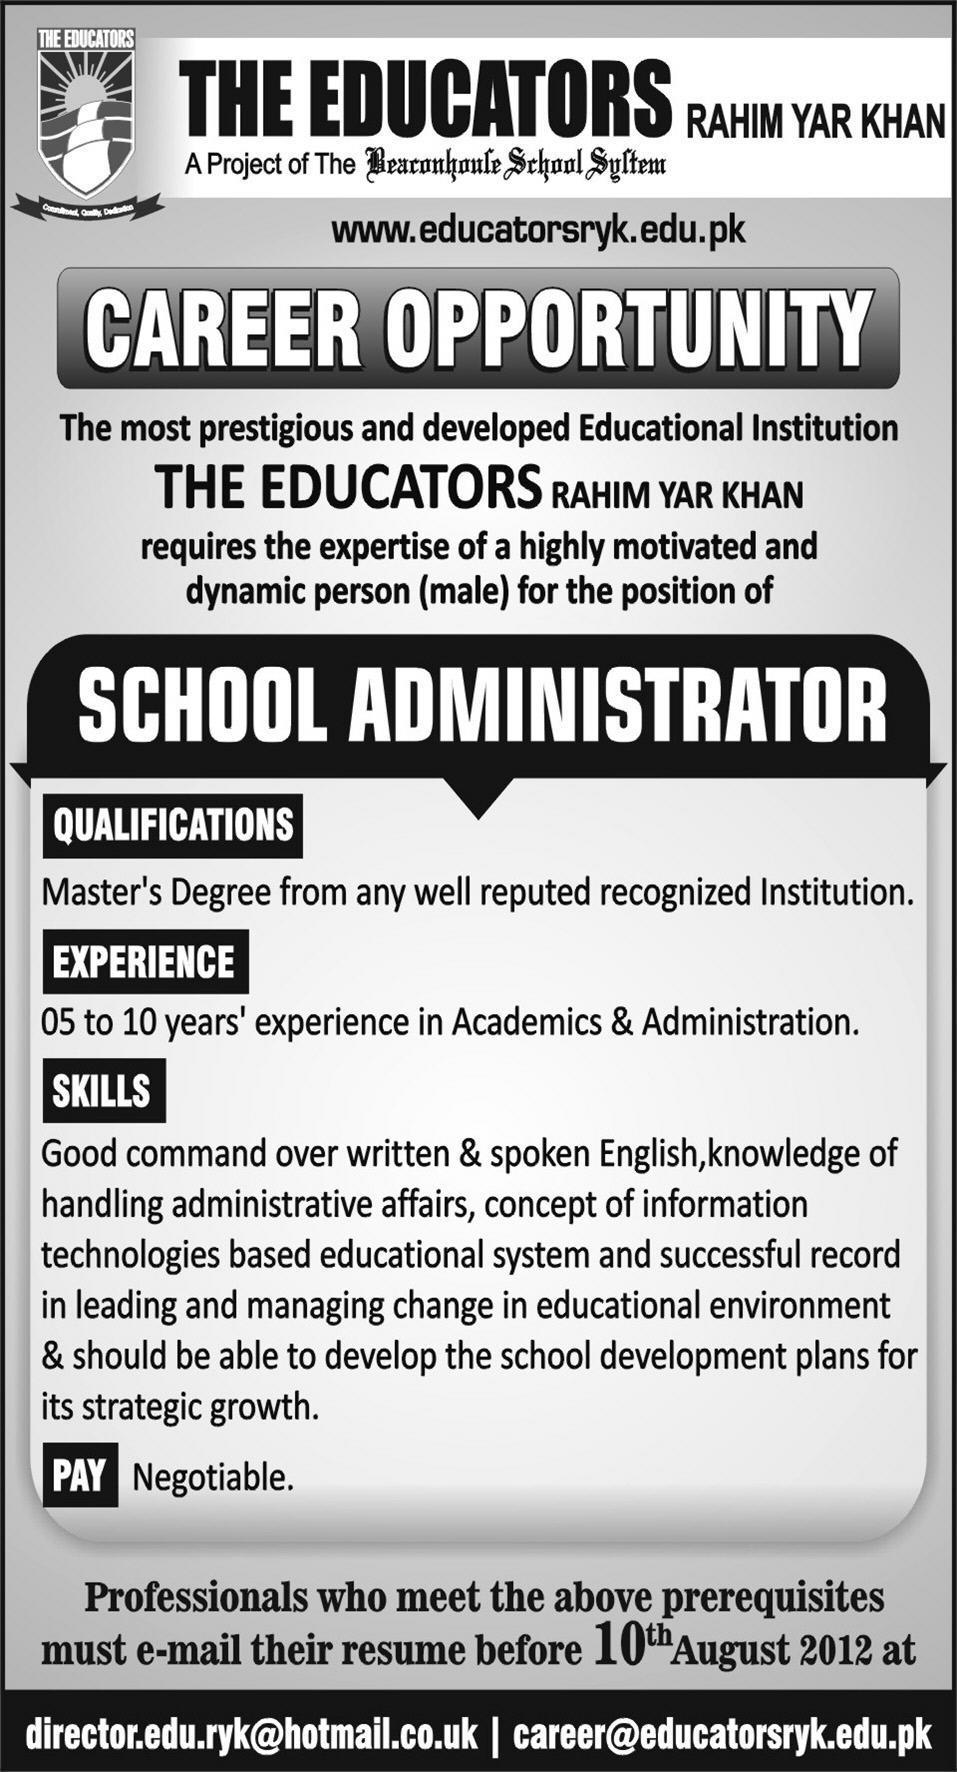 Teaching Jobs in Educators in Rahim yar Khan 2012